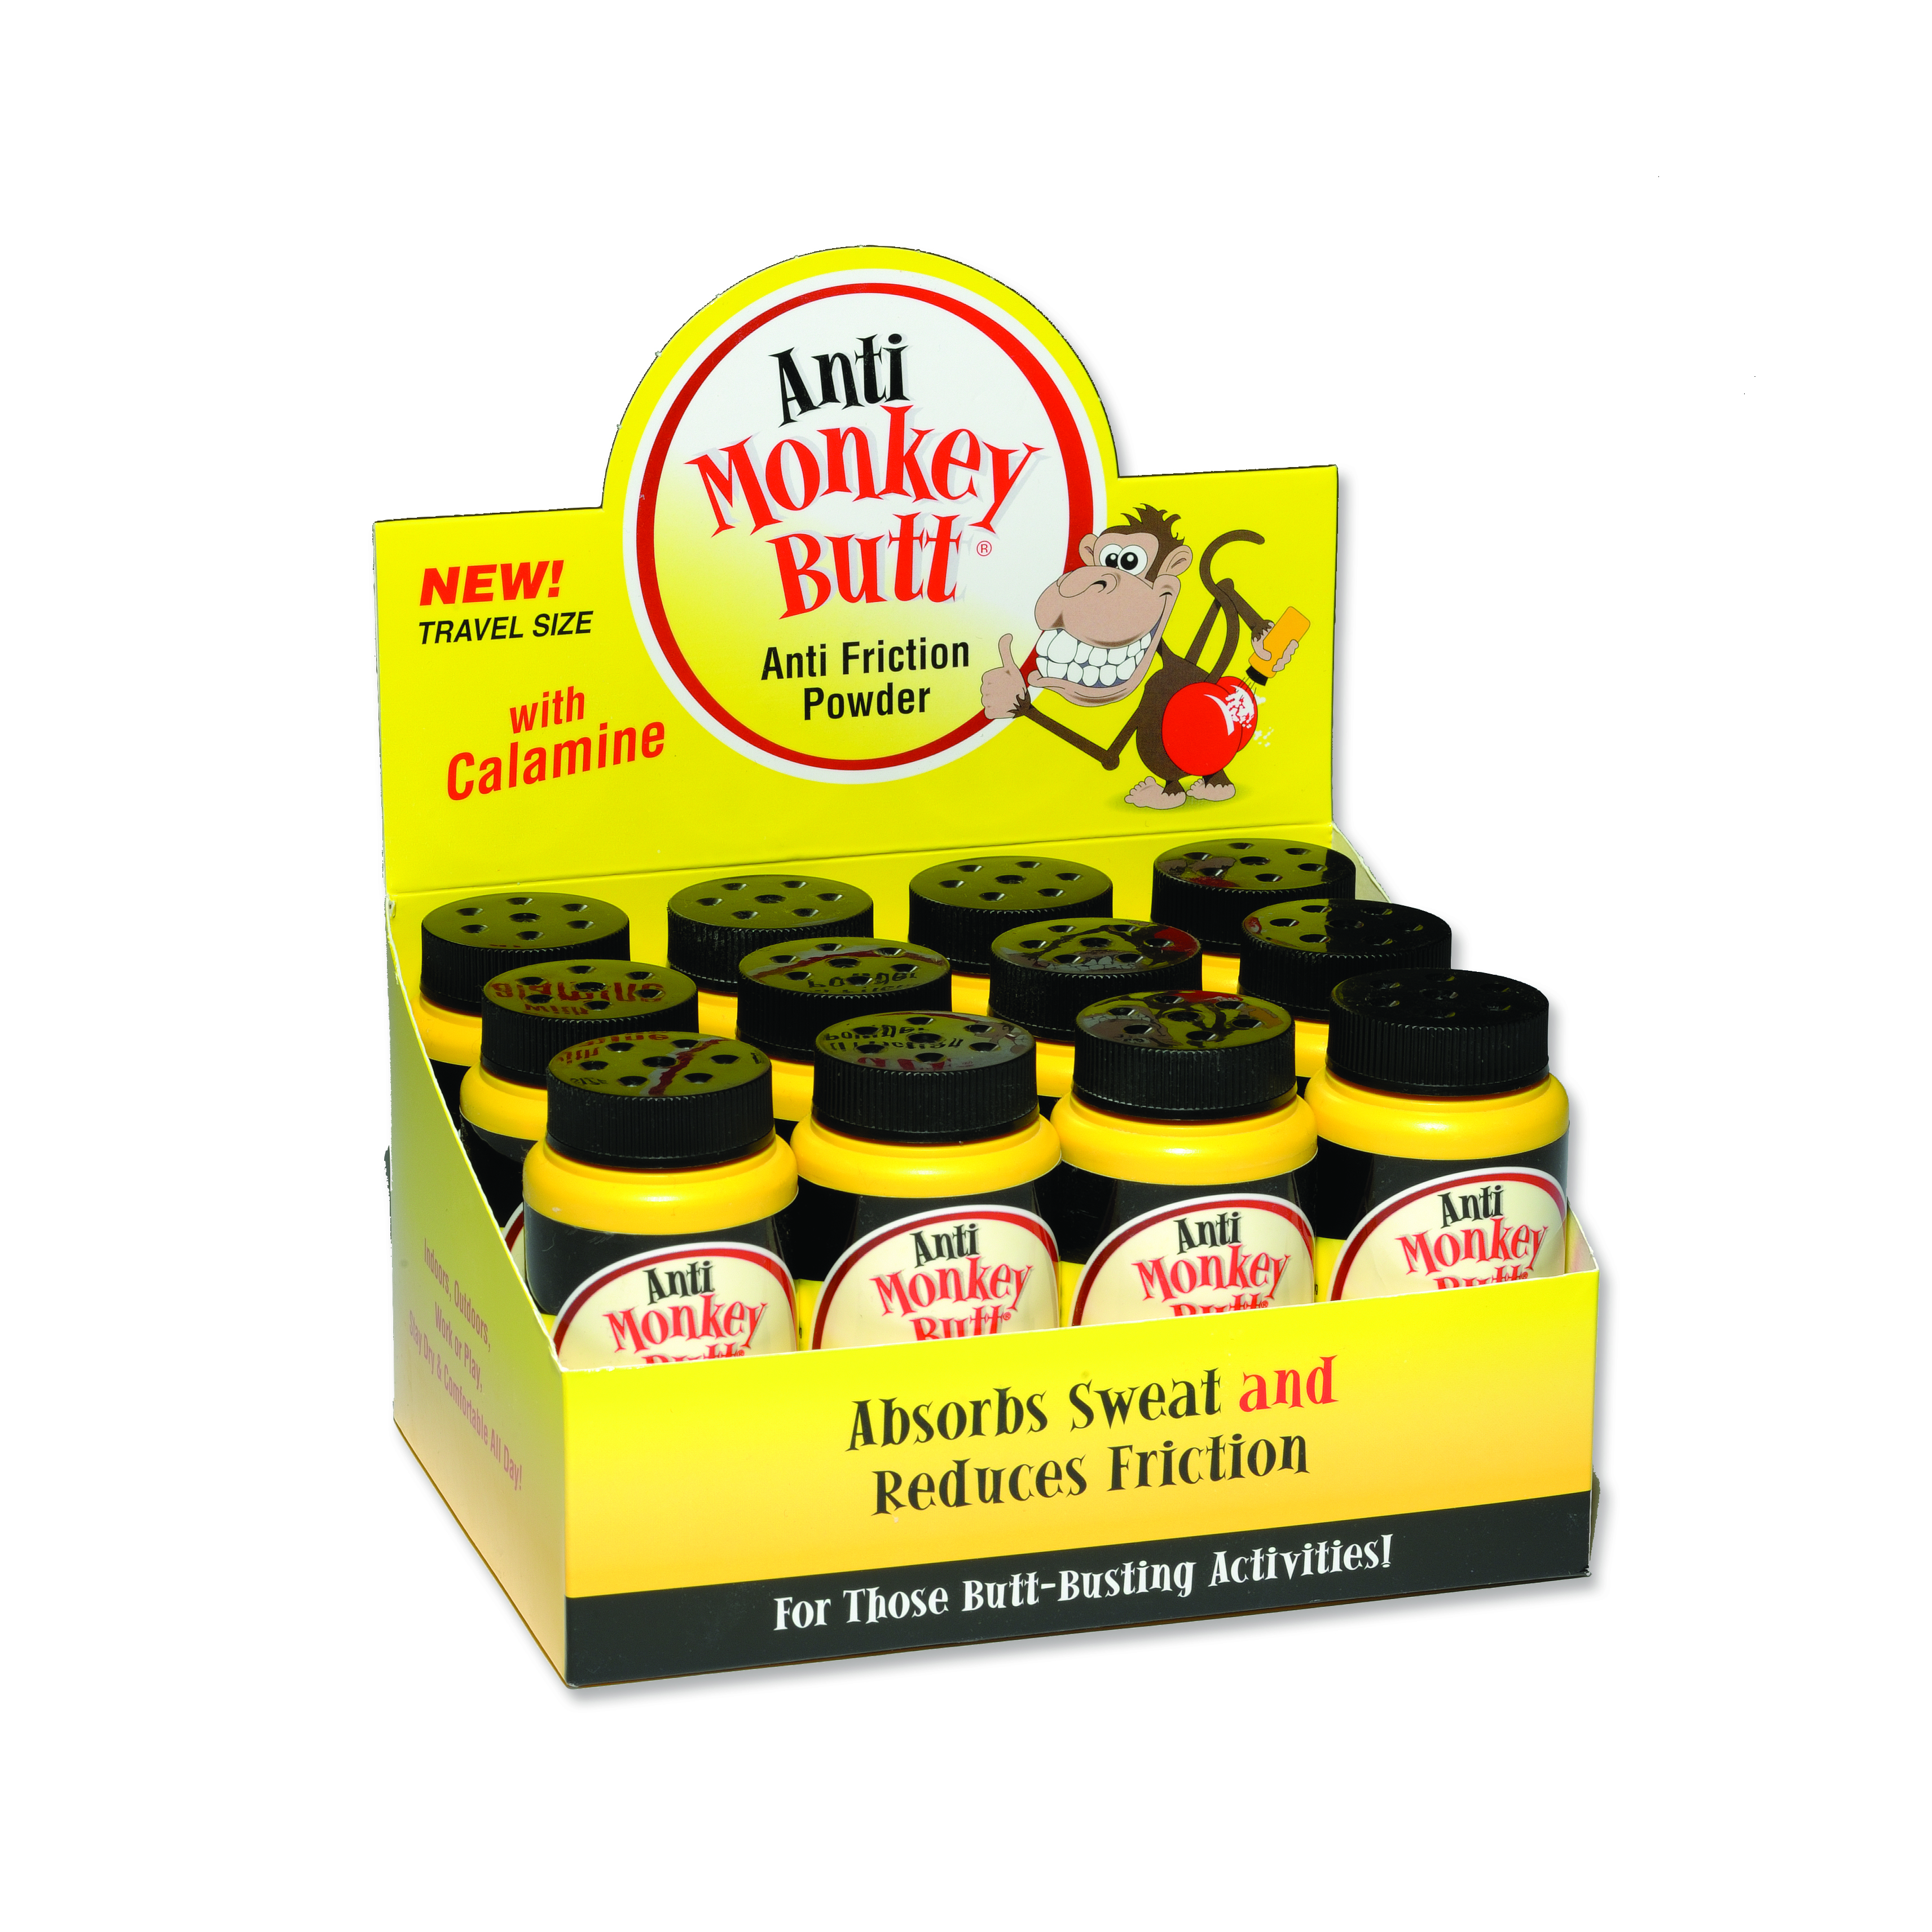 Anti Monkey Butt Powder - Trial Size